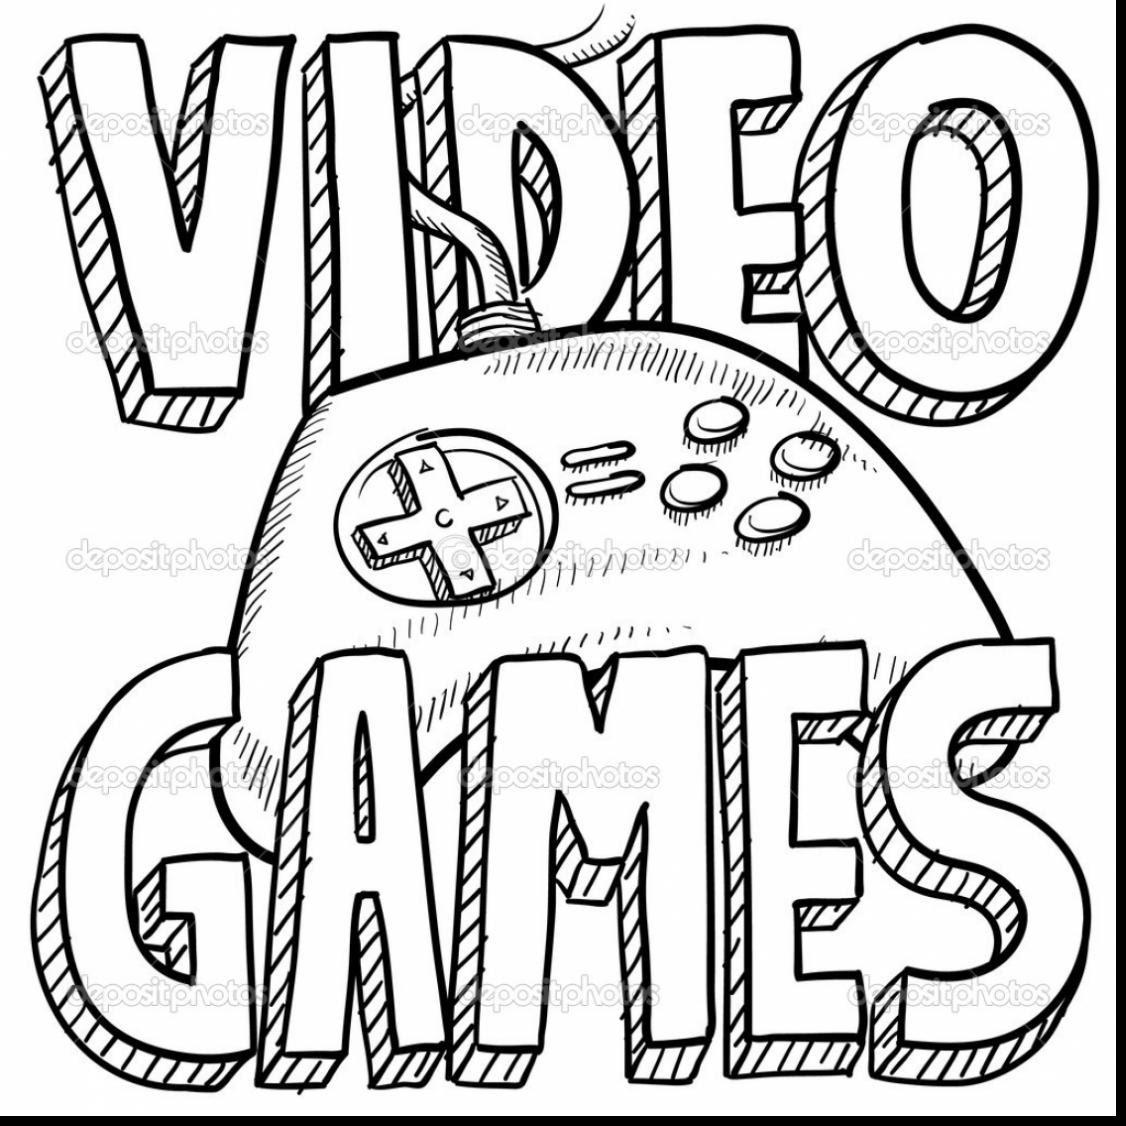 Free Games Drawing at GetDrawings | Free download